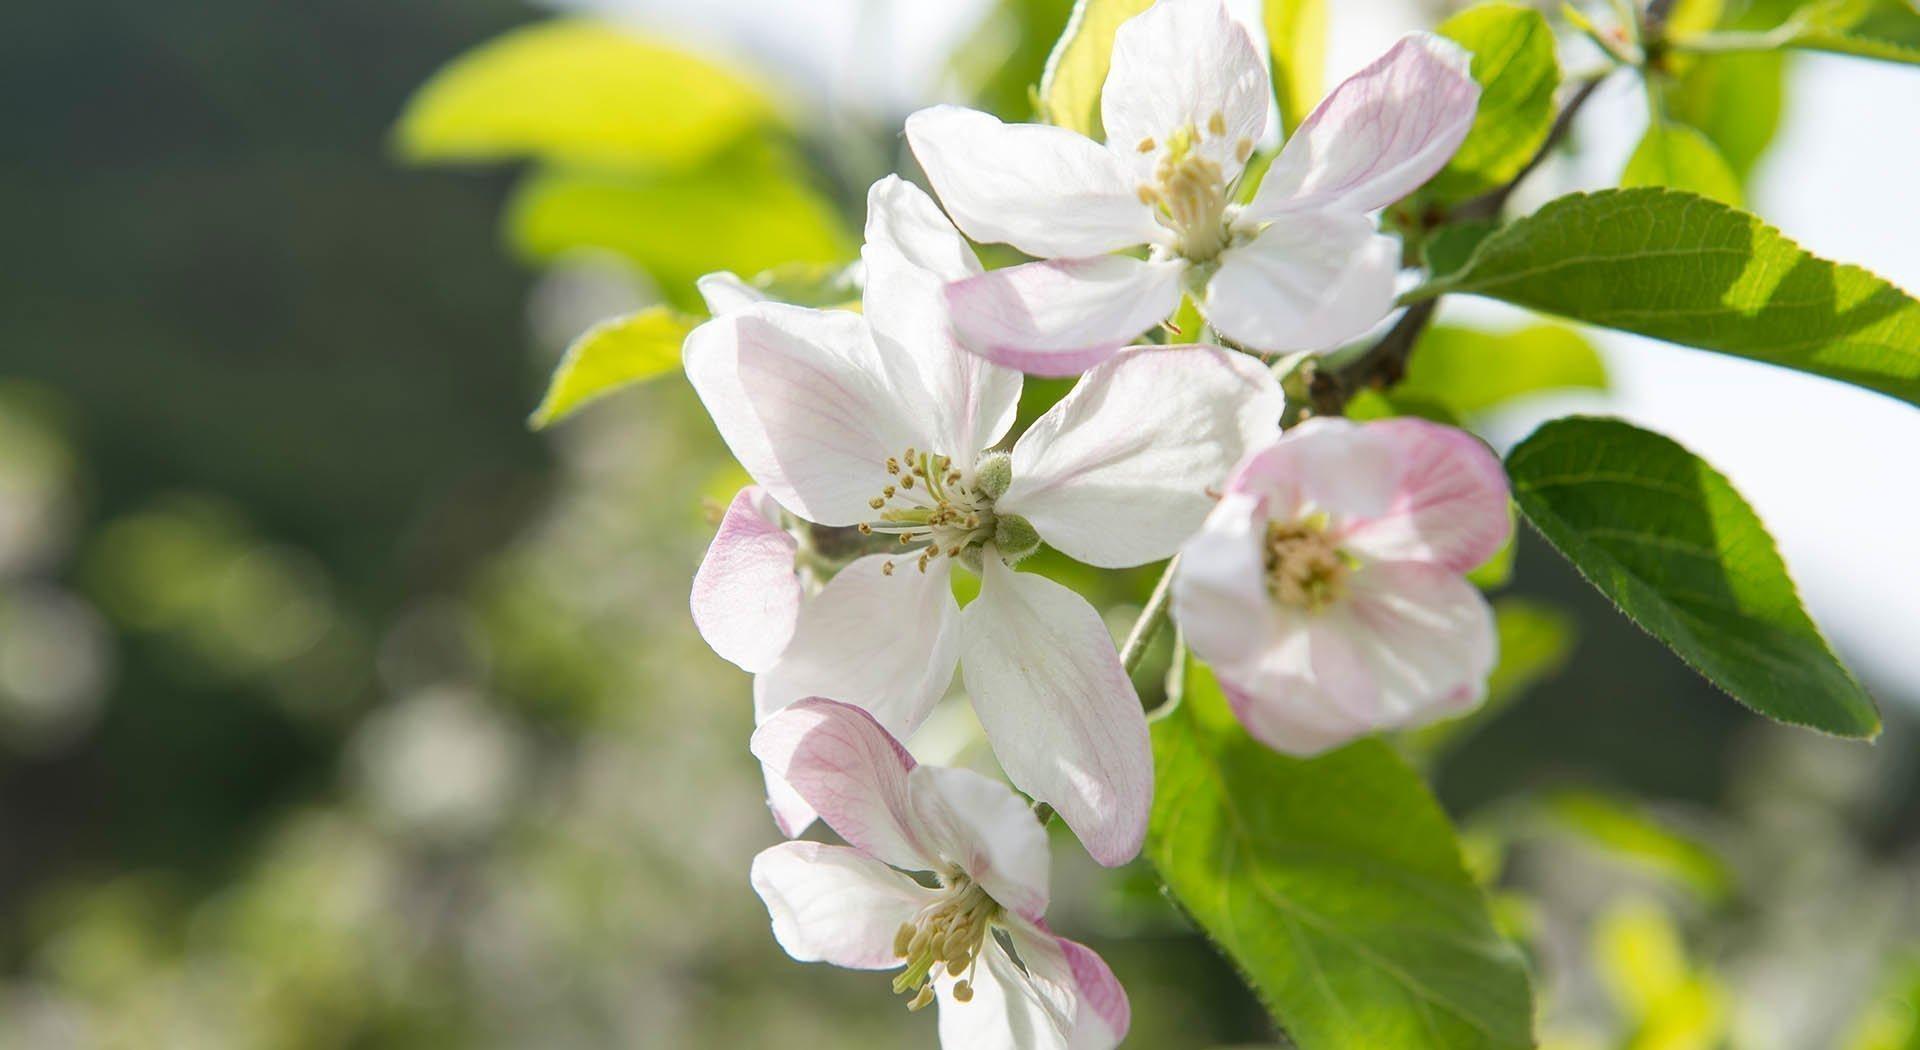 Südtiroler Frühling Blütezeit auf dem Apfel-Hochplateau Natz-Schabs